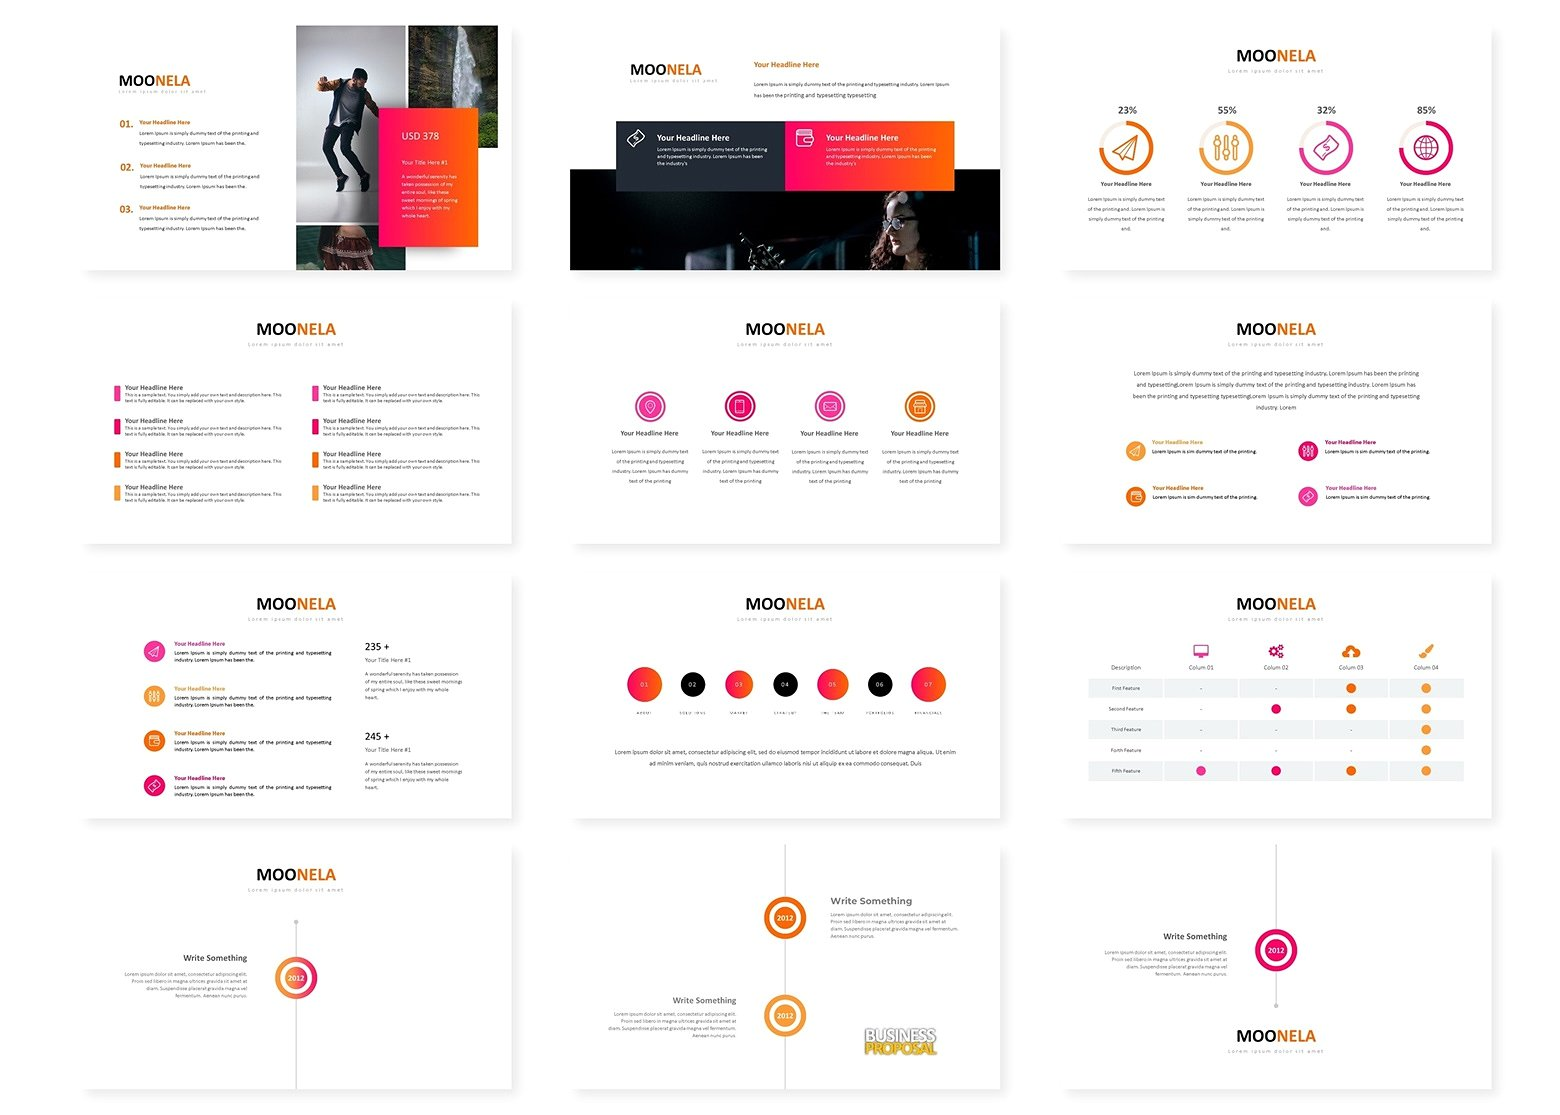 超巨量的红色企业介绍幻灯片模板 Super Huge Red Corporate Presentation Slide Template插图2